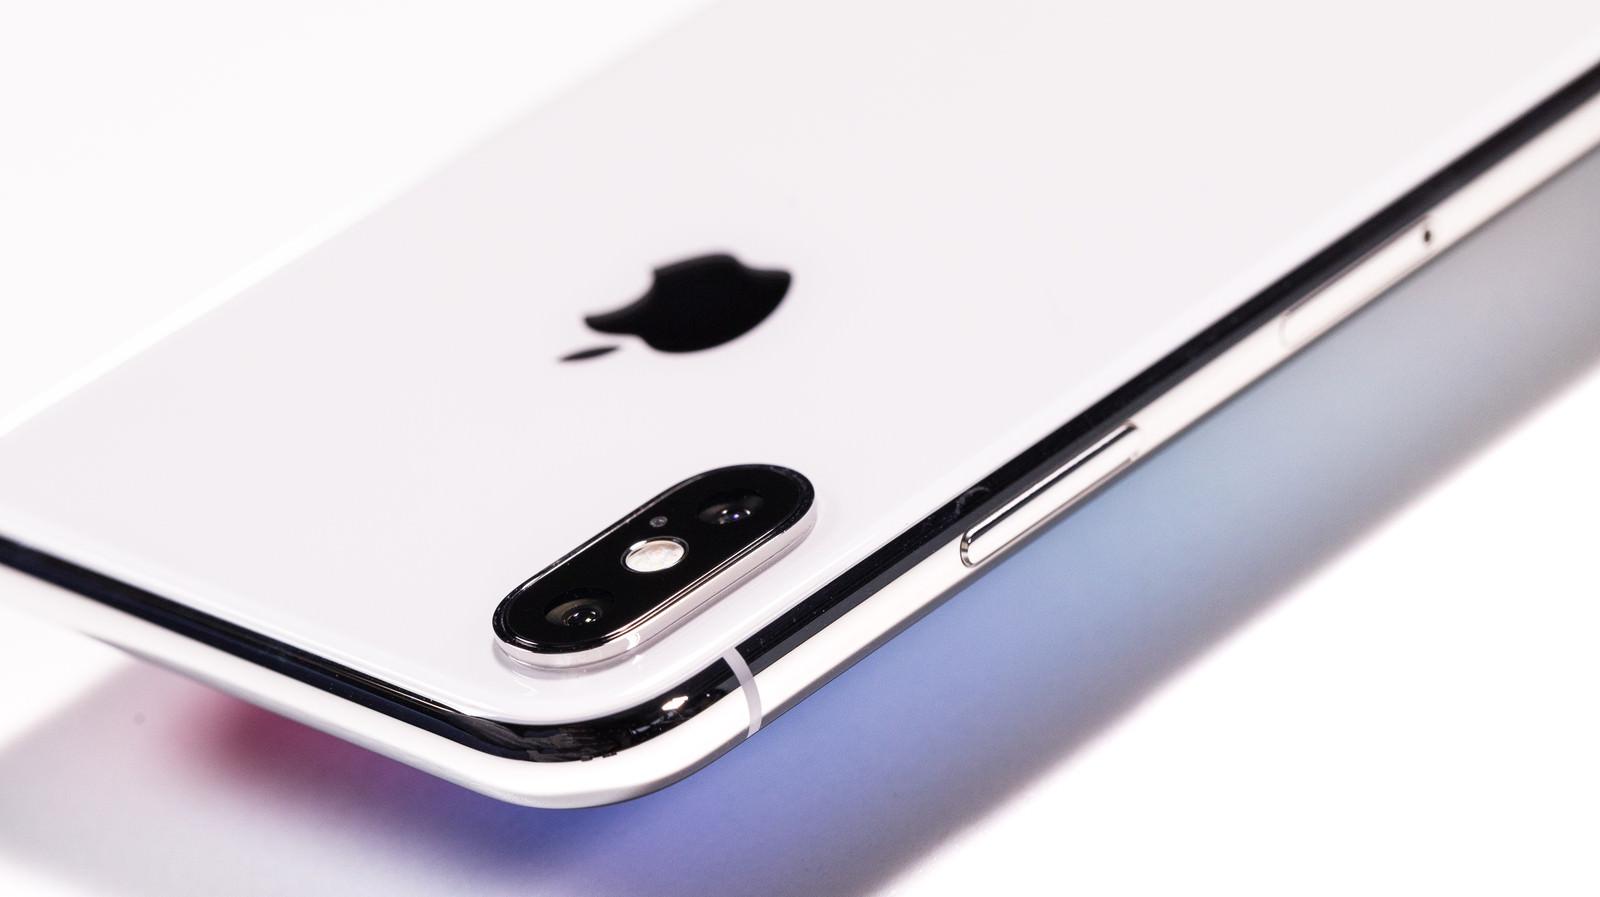 「iPhone X のサイドボタン」の写真